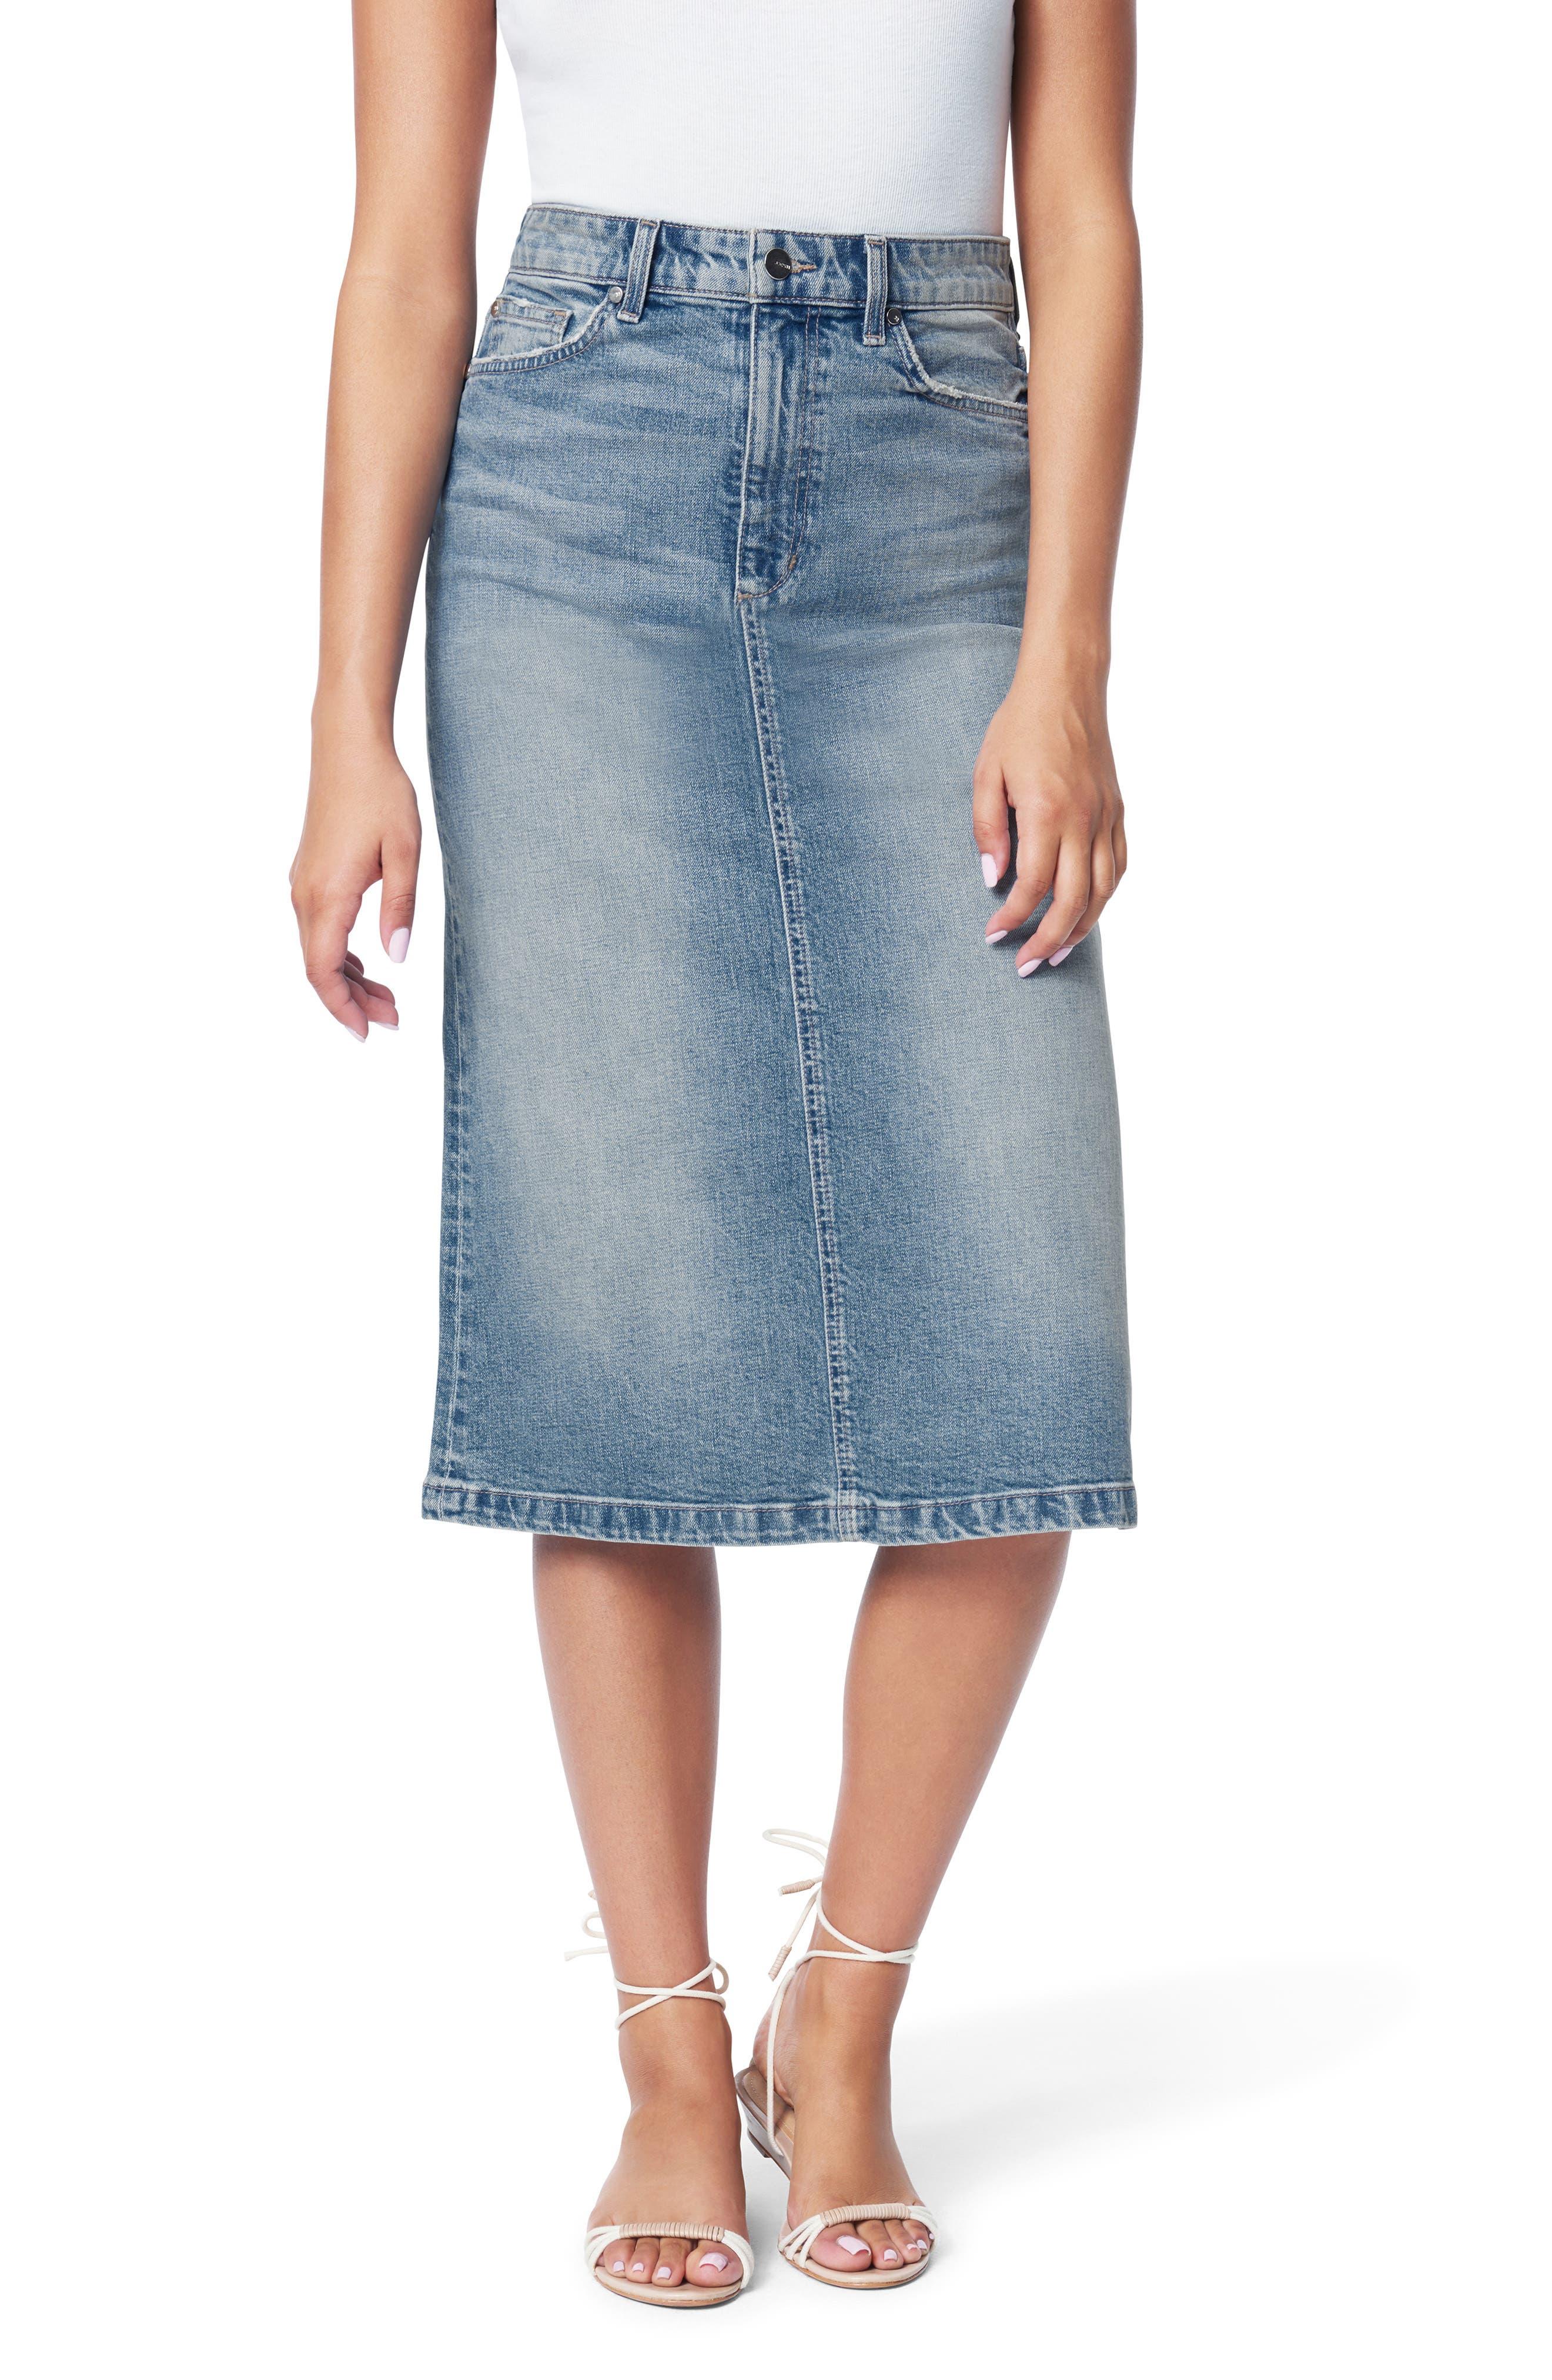 The A-Line Cutoff Denim Pencil Skirt